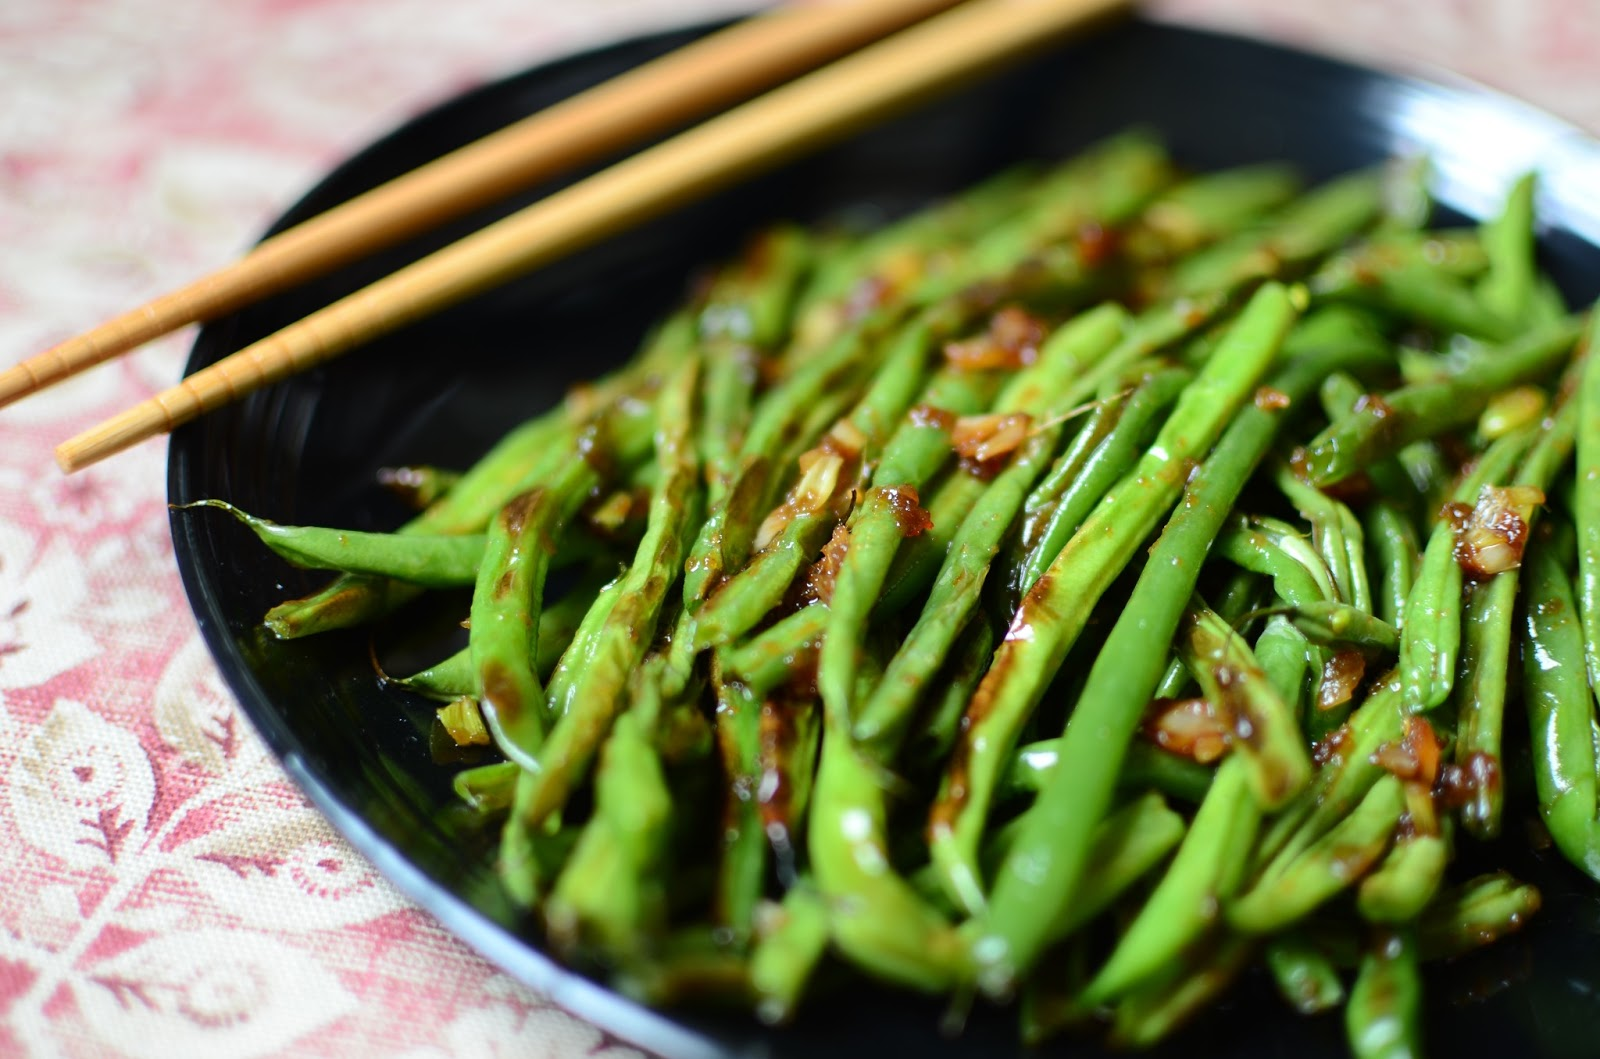 ButterYum: Wrinkled Asian-Style Green Beans